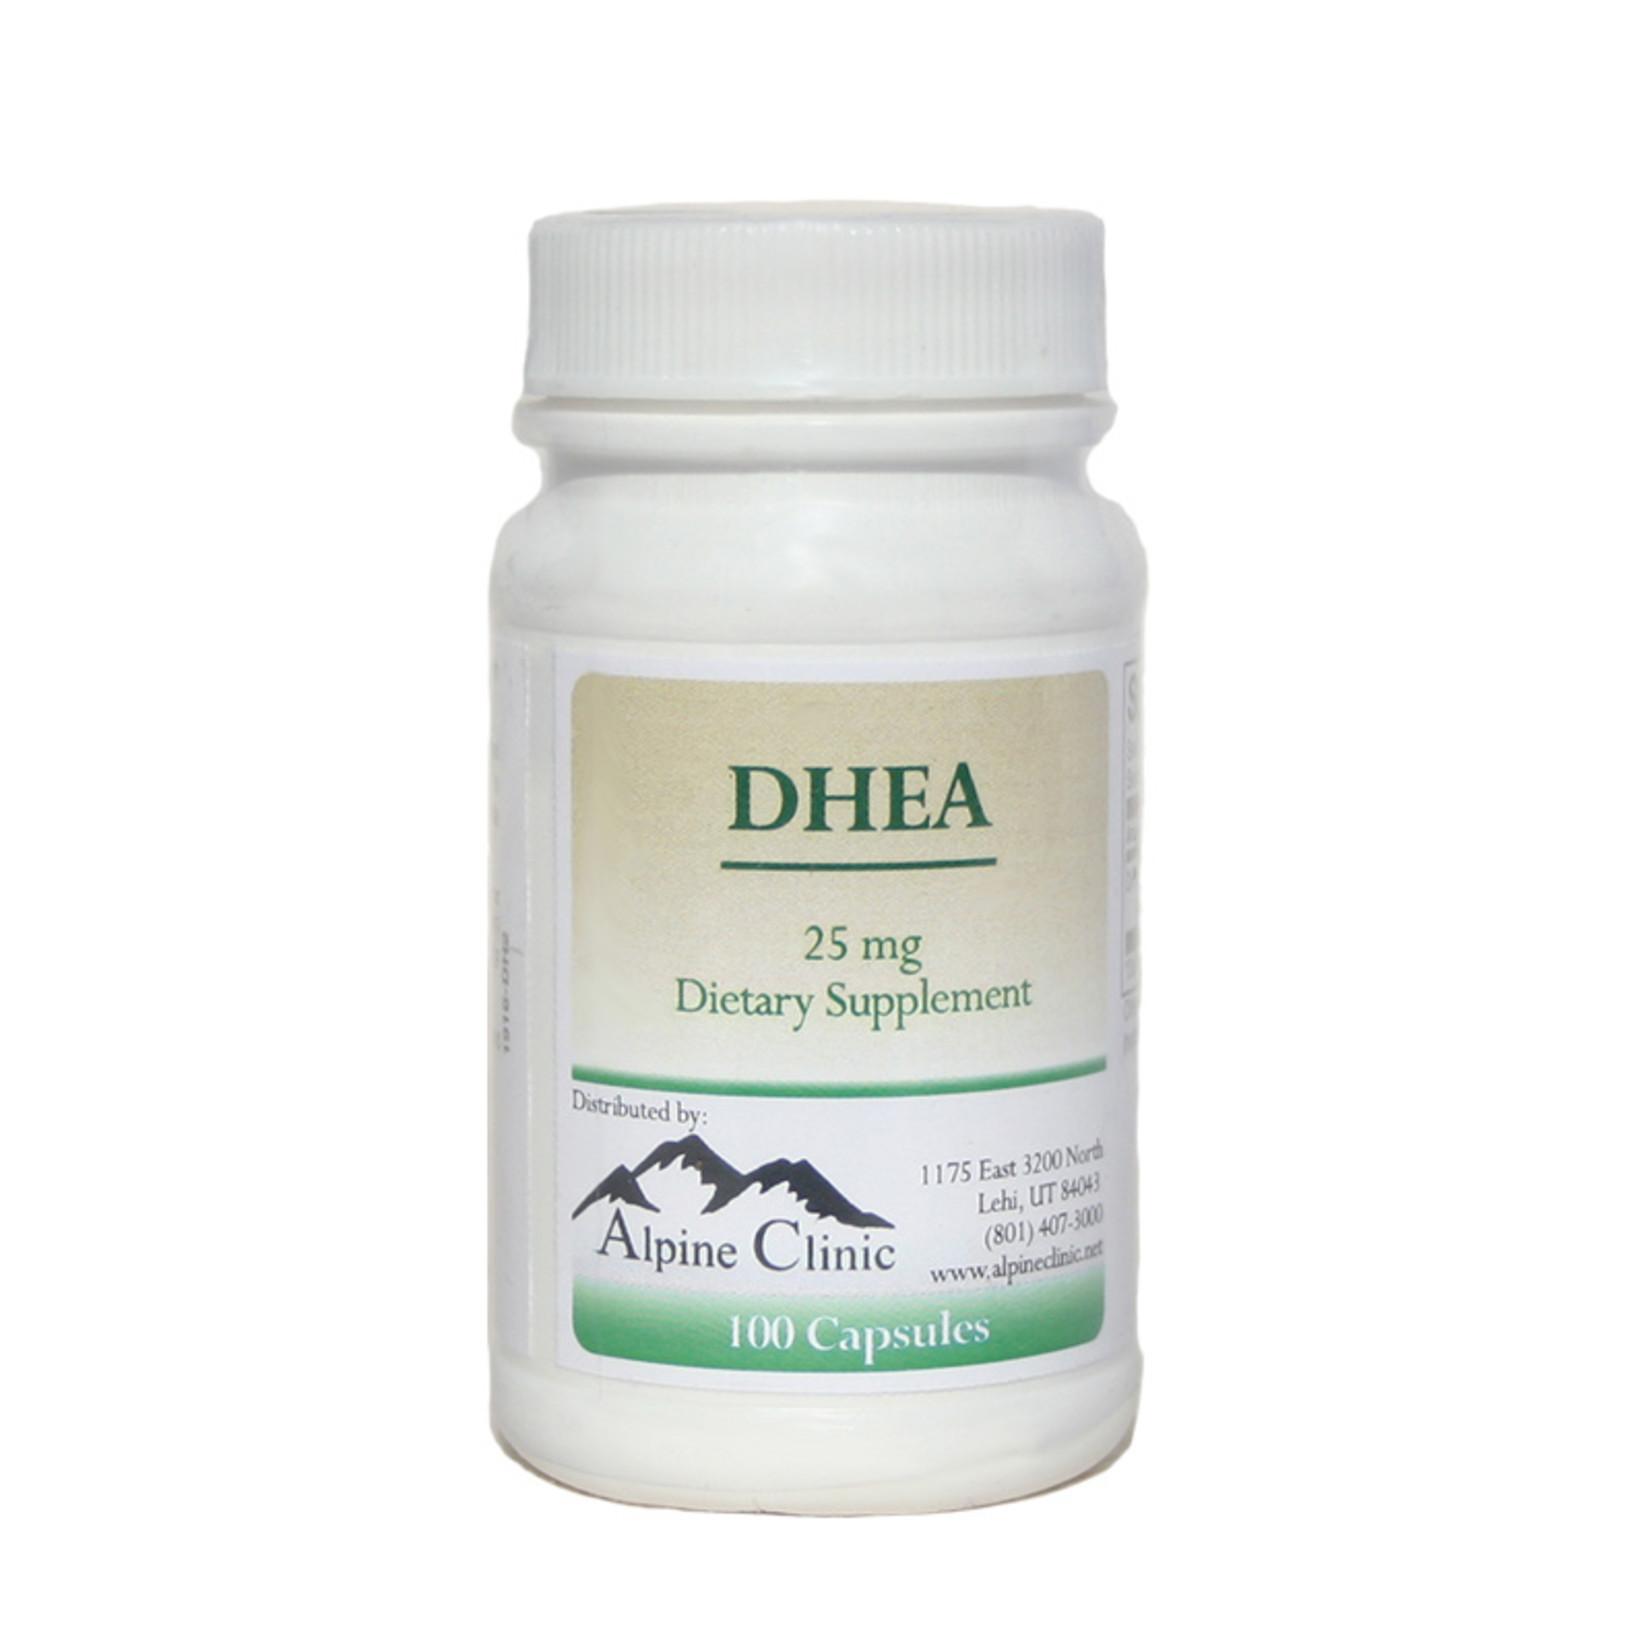 Alpine Clinic PL DHEA